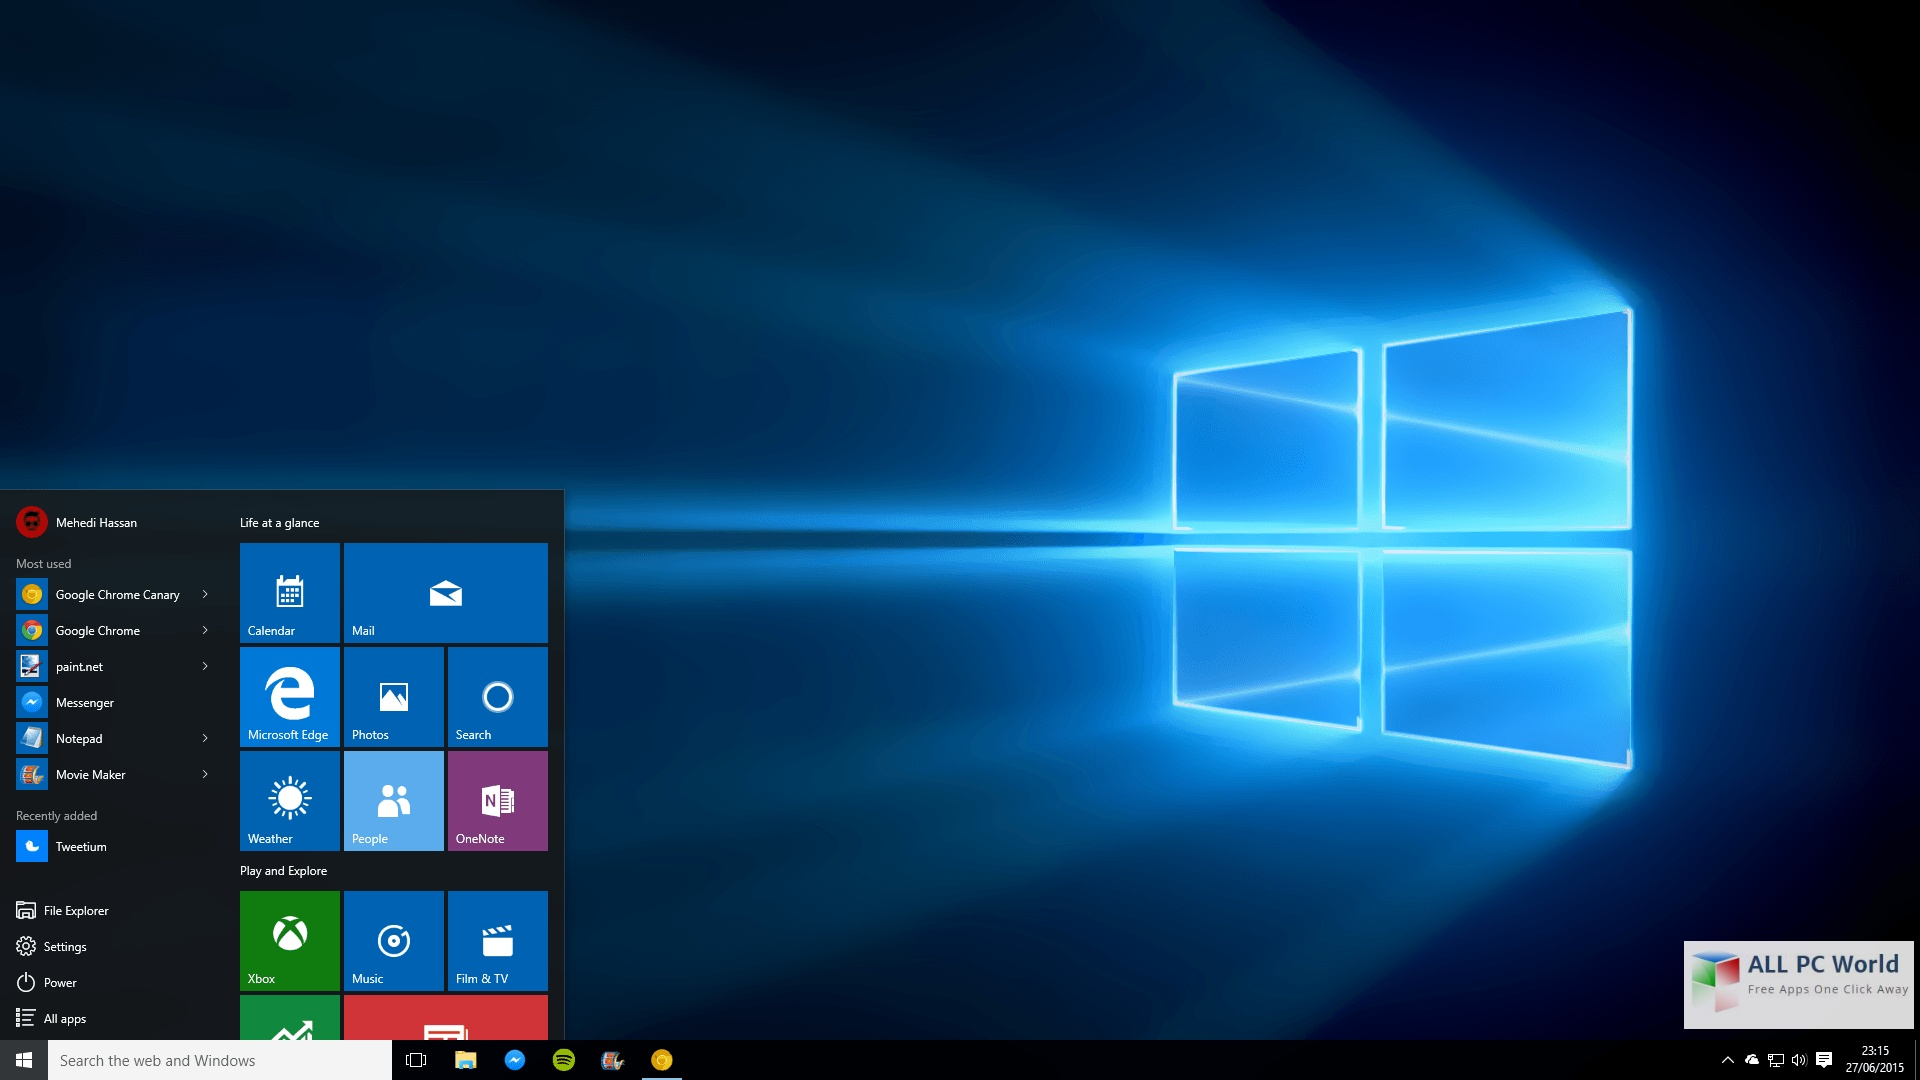 Download Windows 10 15063.250 May 2017 OEM RTM DVD ISO RS2 Gen2